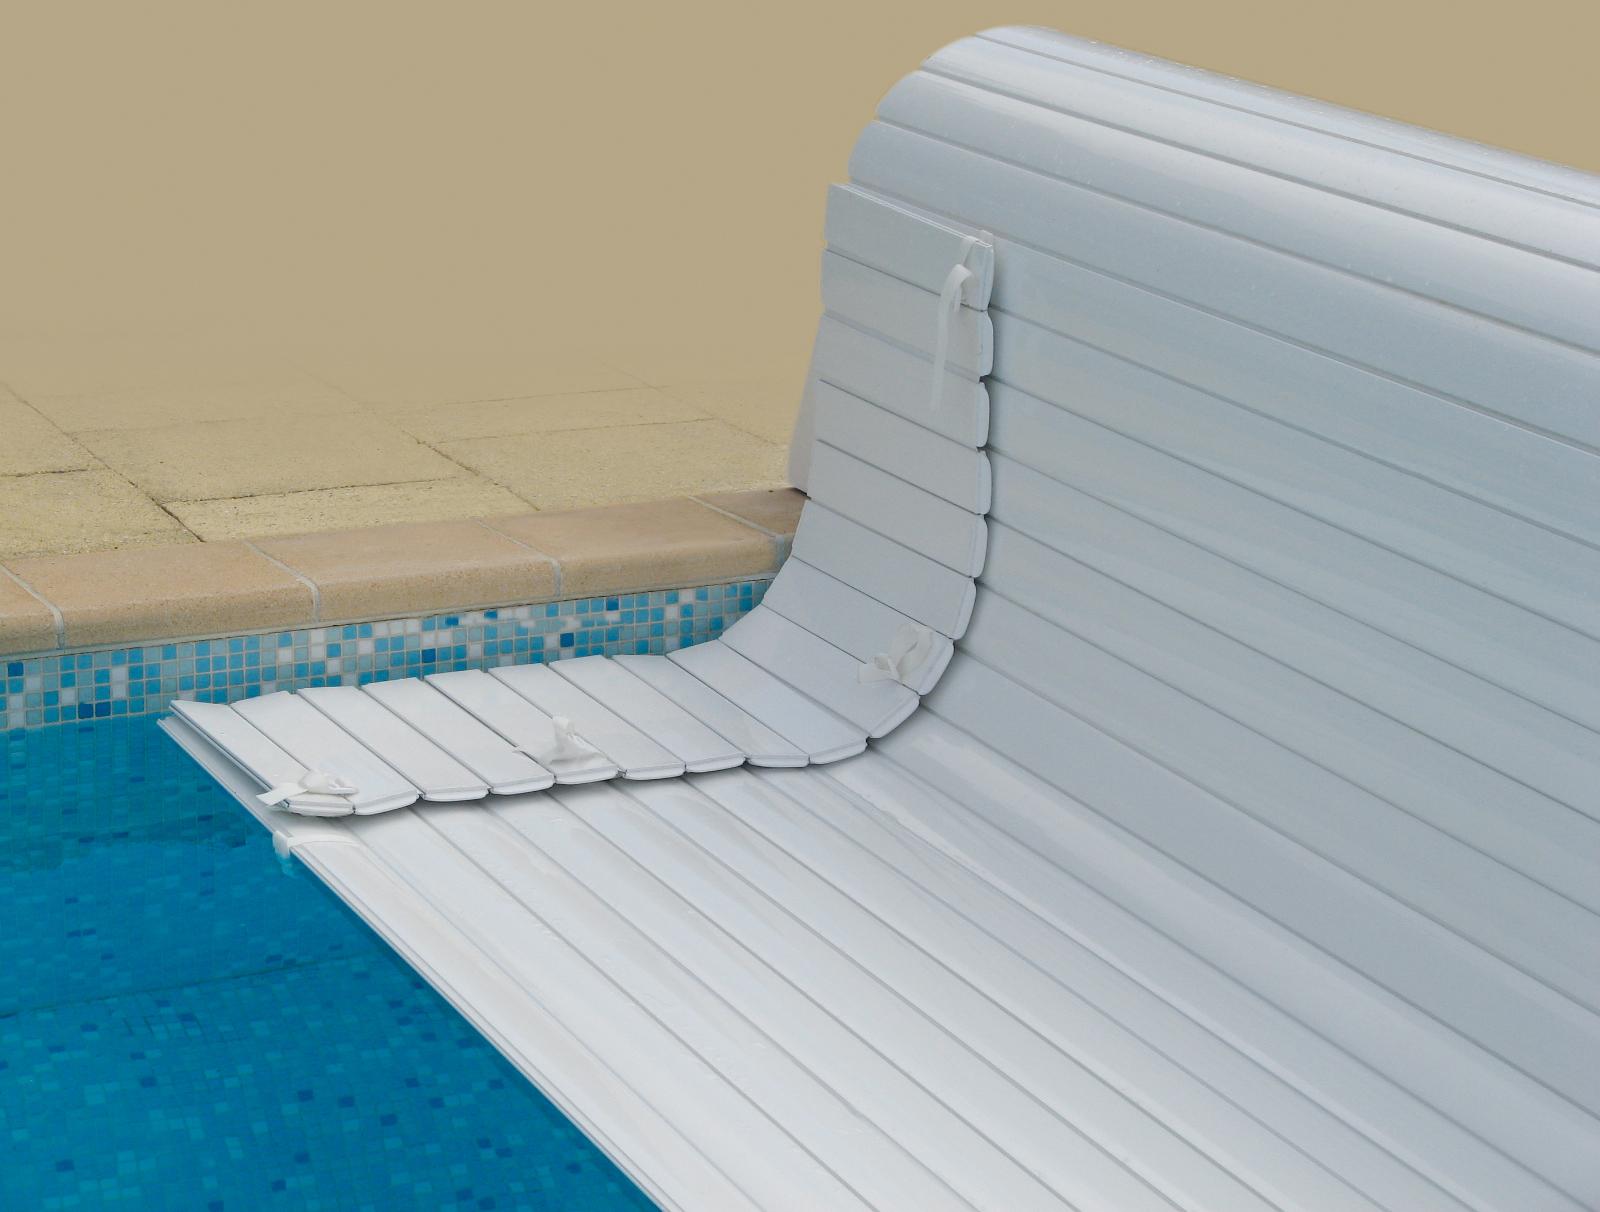 lames de volet de piscine volet flottant de piscine. Black Bedroom Furniture Sets. Home Design Ideas